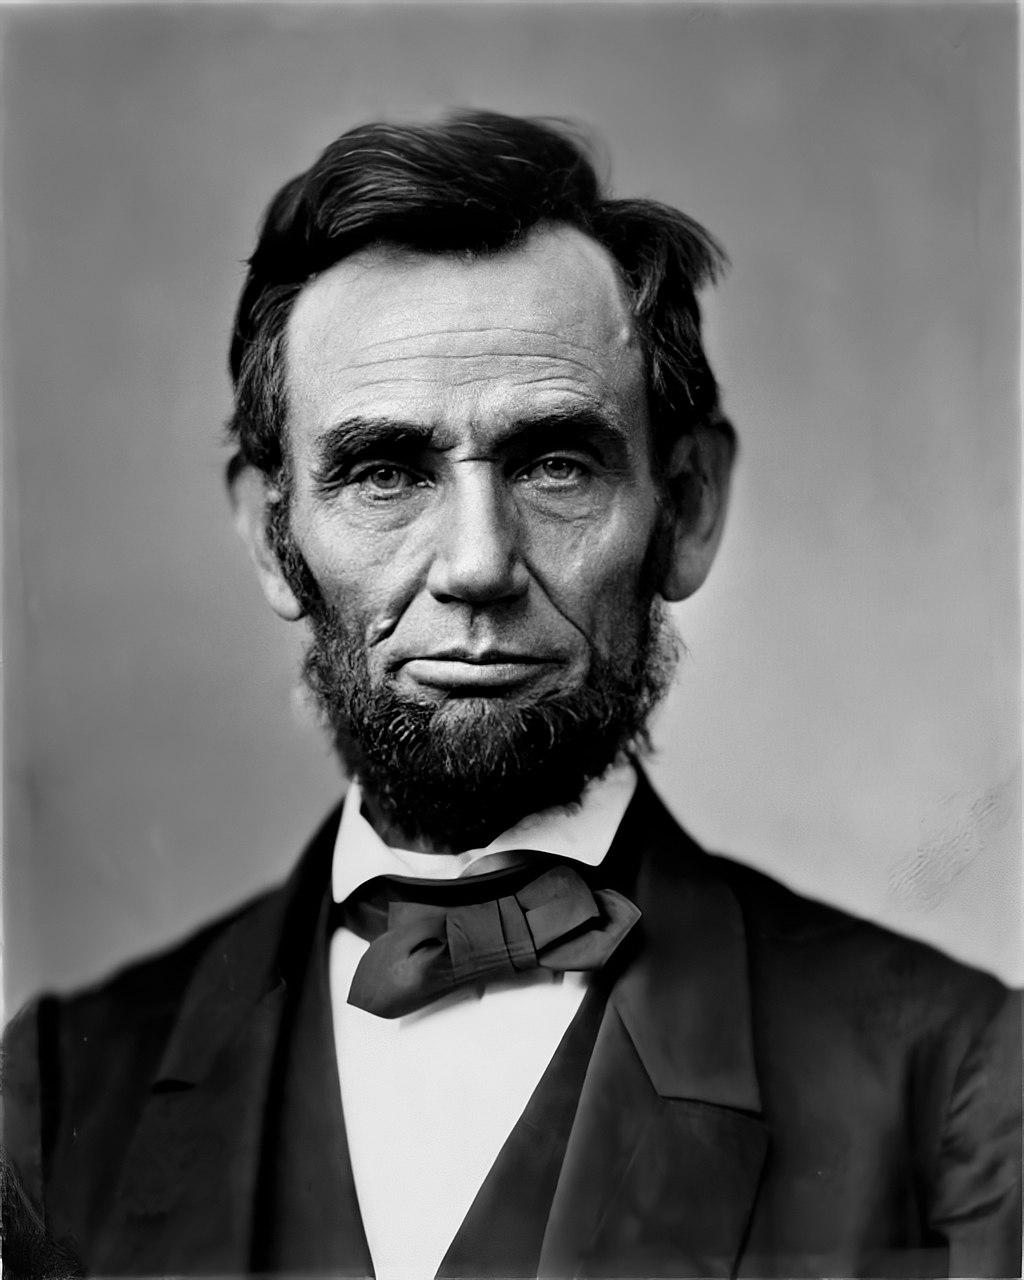 Lincoln at Gettysburg by Alexander Gardner